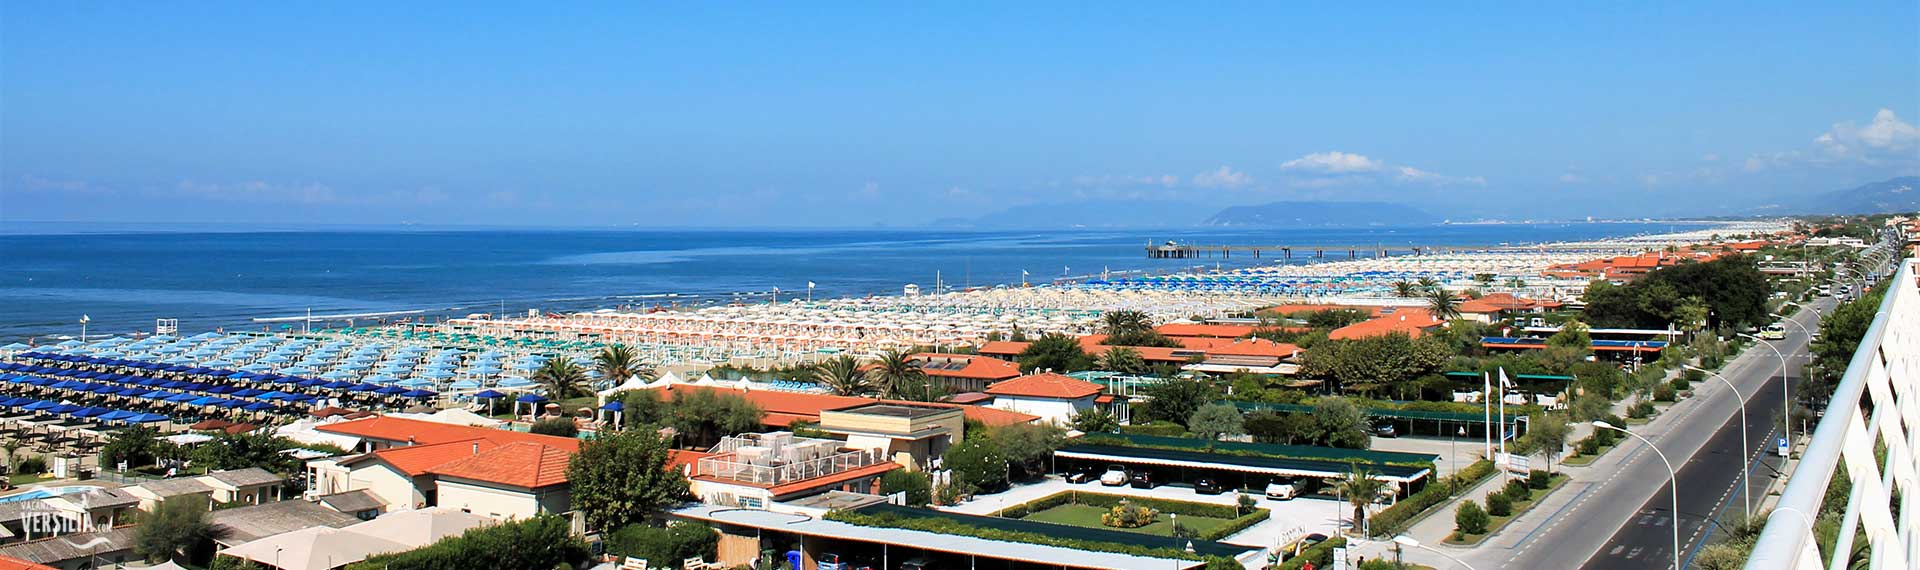 Hotel Joseph Marina di Pietrasanta | Hotel 3 stelle in ...